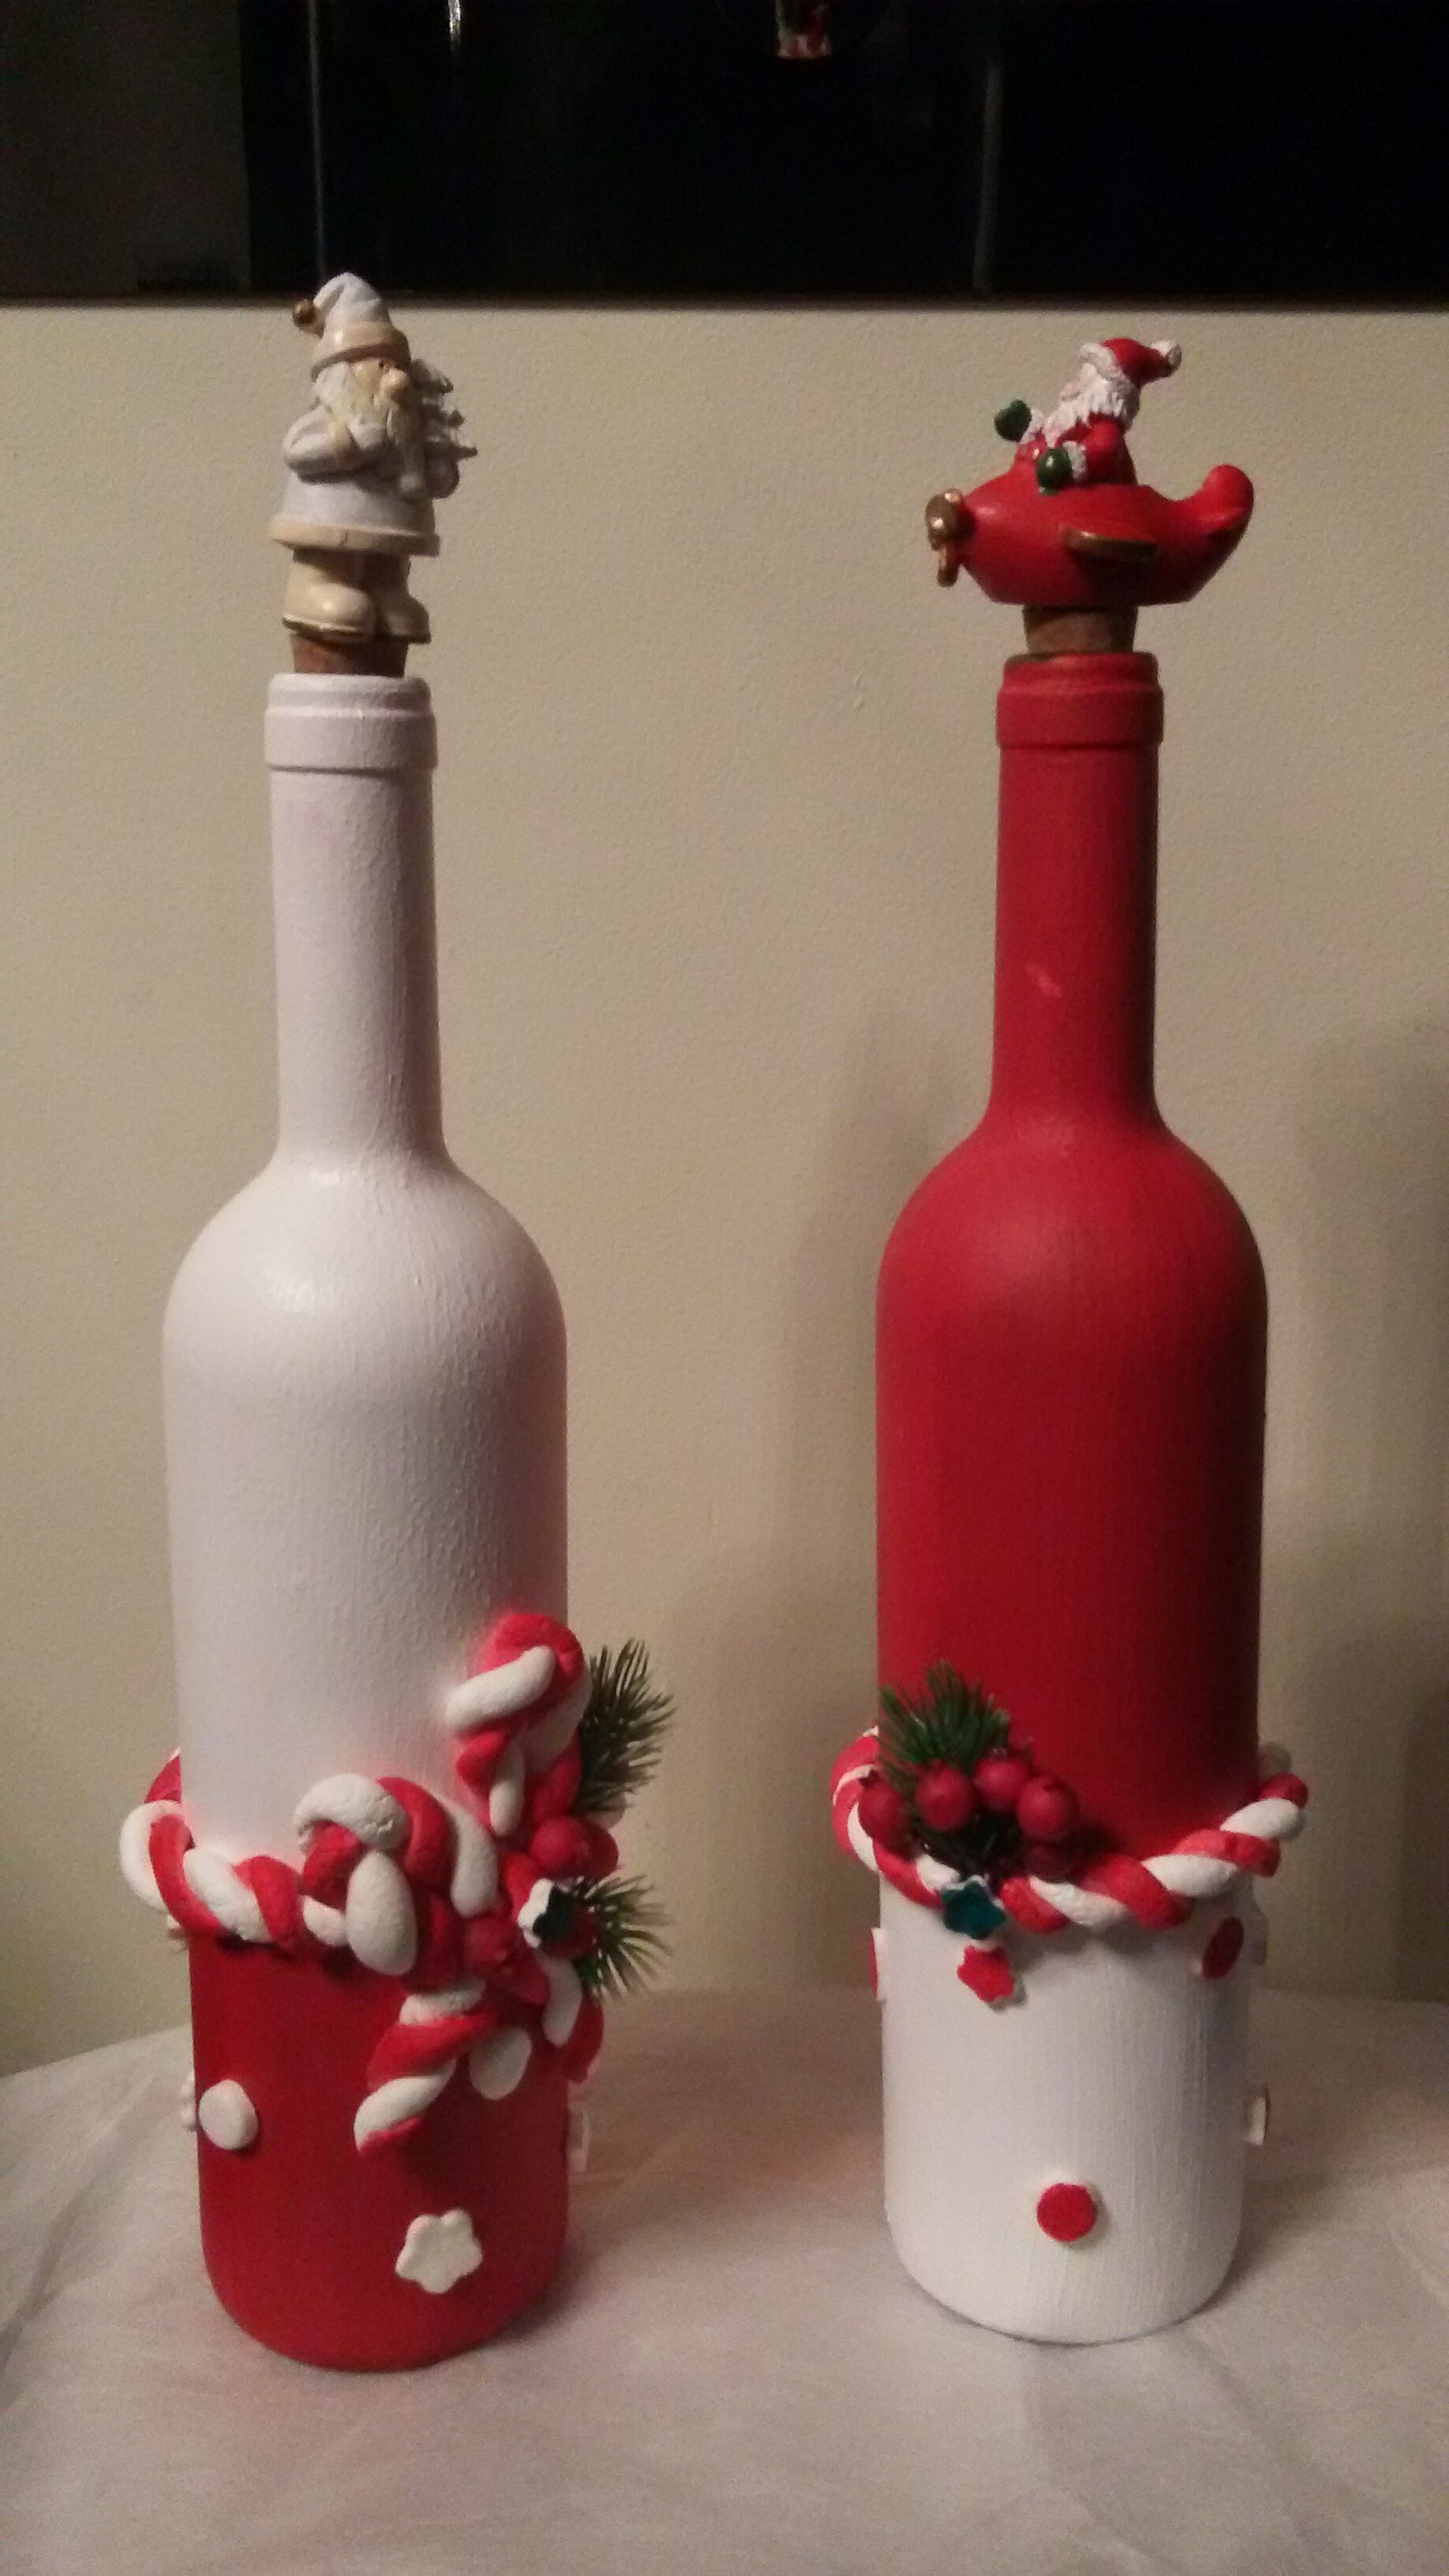 снег бутыль новыйгод год ёлка снеговик бутылка новый дед мороз снежинки